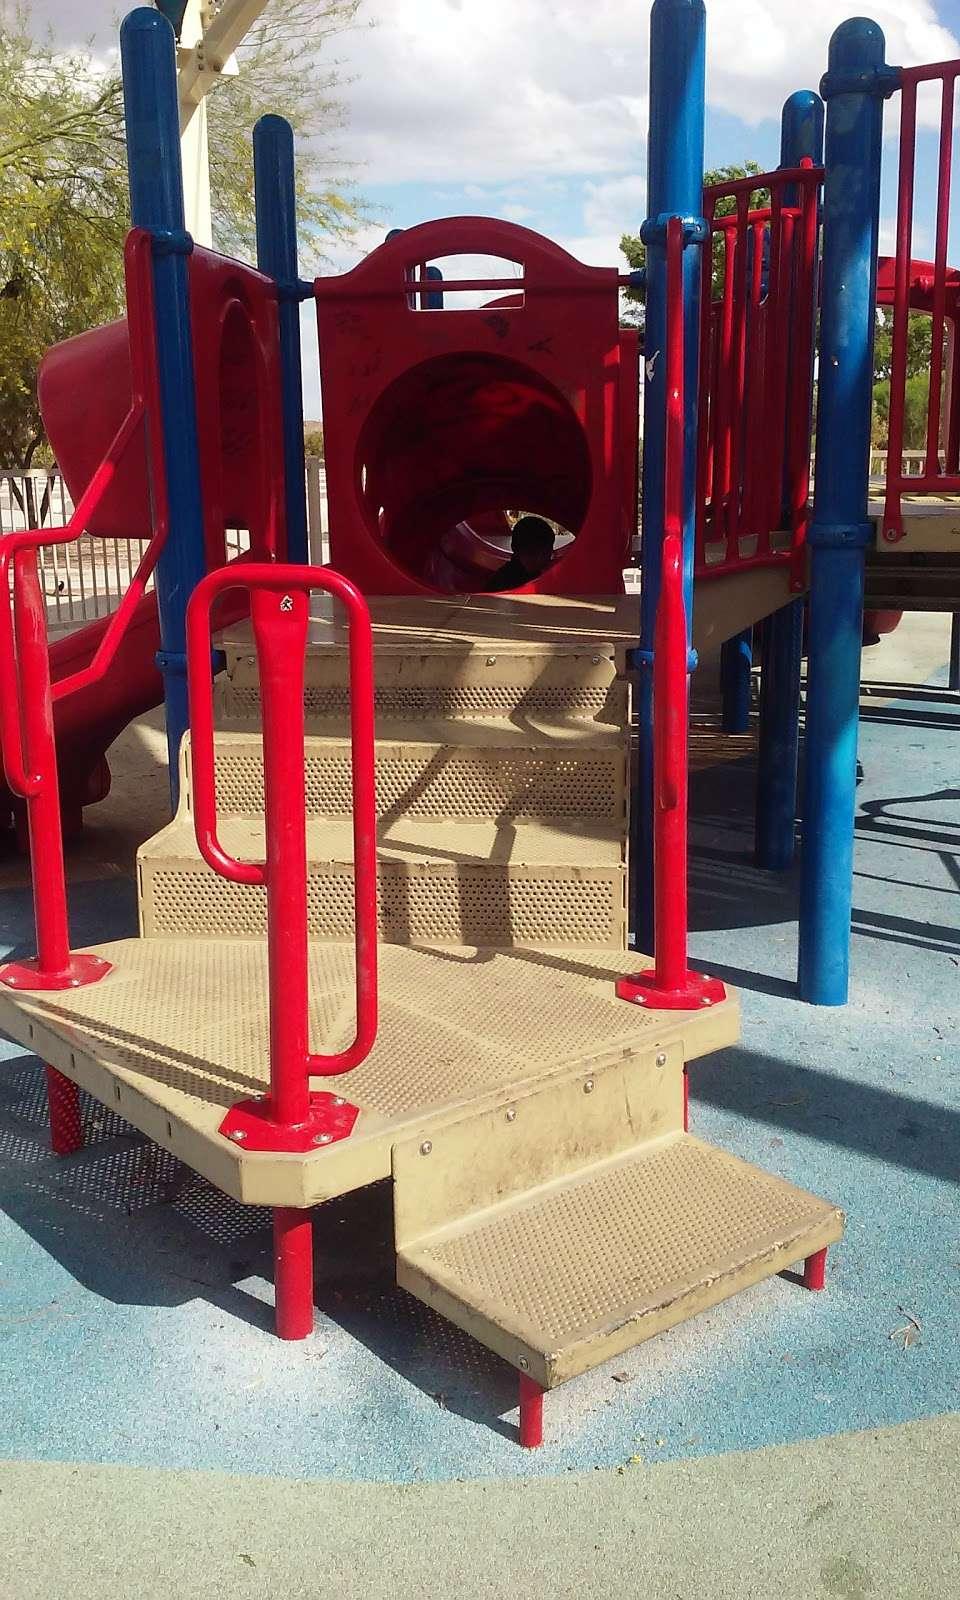 Desert Horizons Park - park  | Photo 4 of 10 | Address: 3750 Simmons Street,, North Las Vegas, NV 89032, USA | Phone: (702) 633-1171